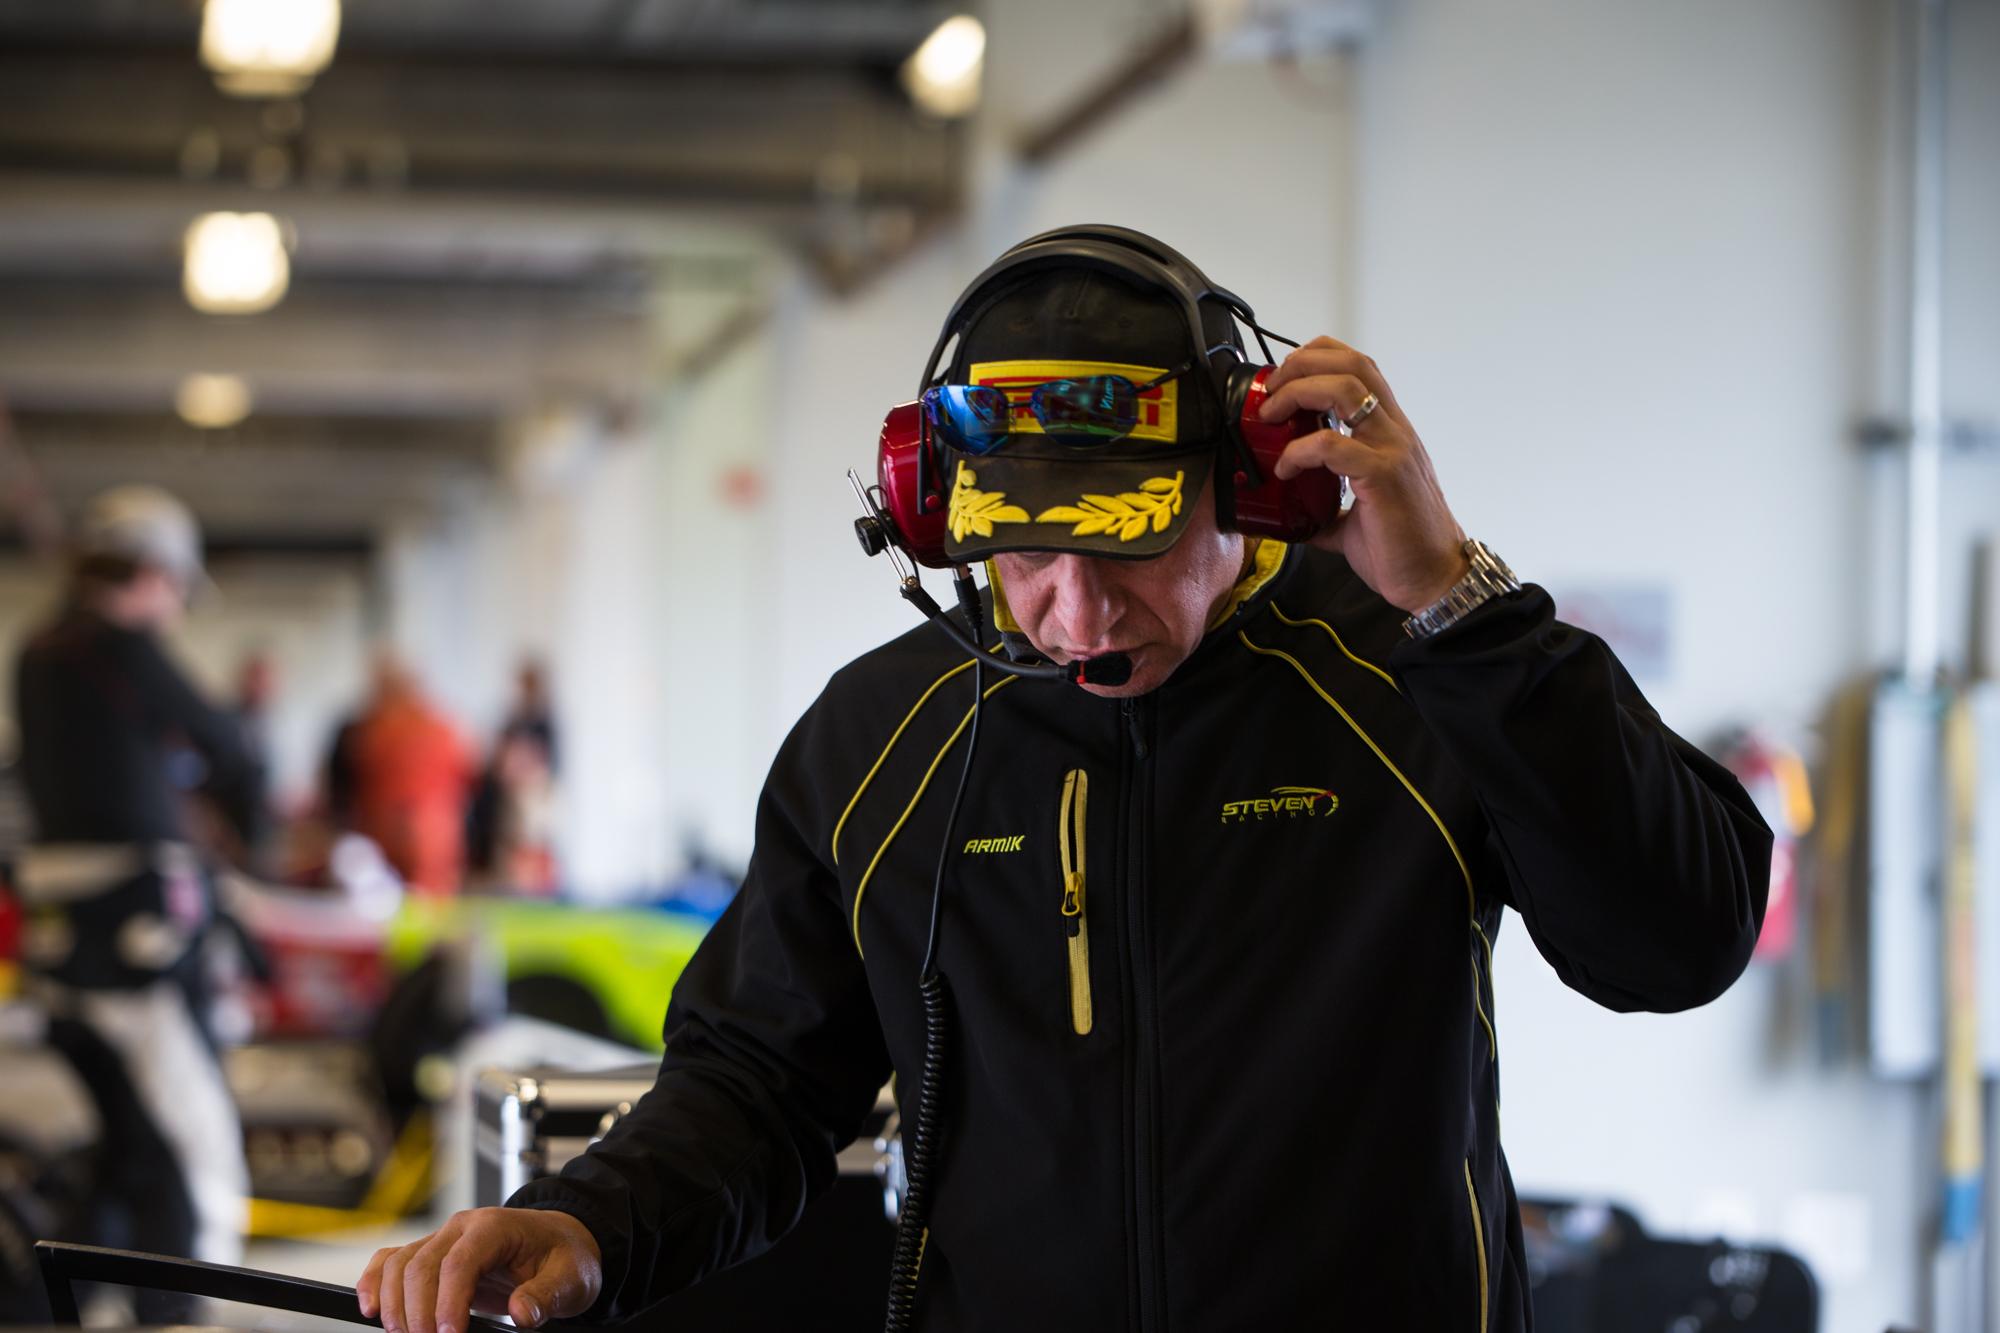 Steven-Racing-Laguna-20180531-96073.jpg